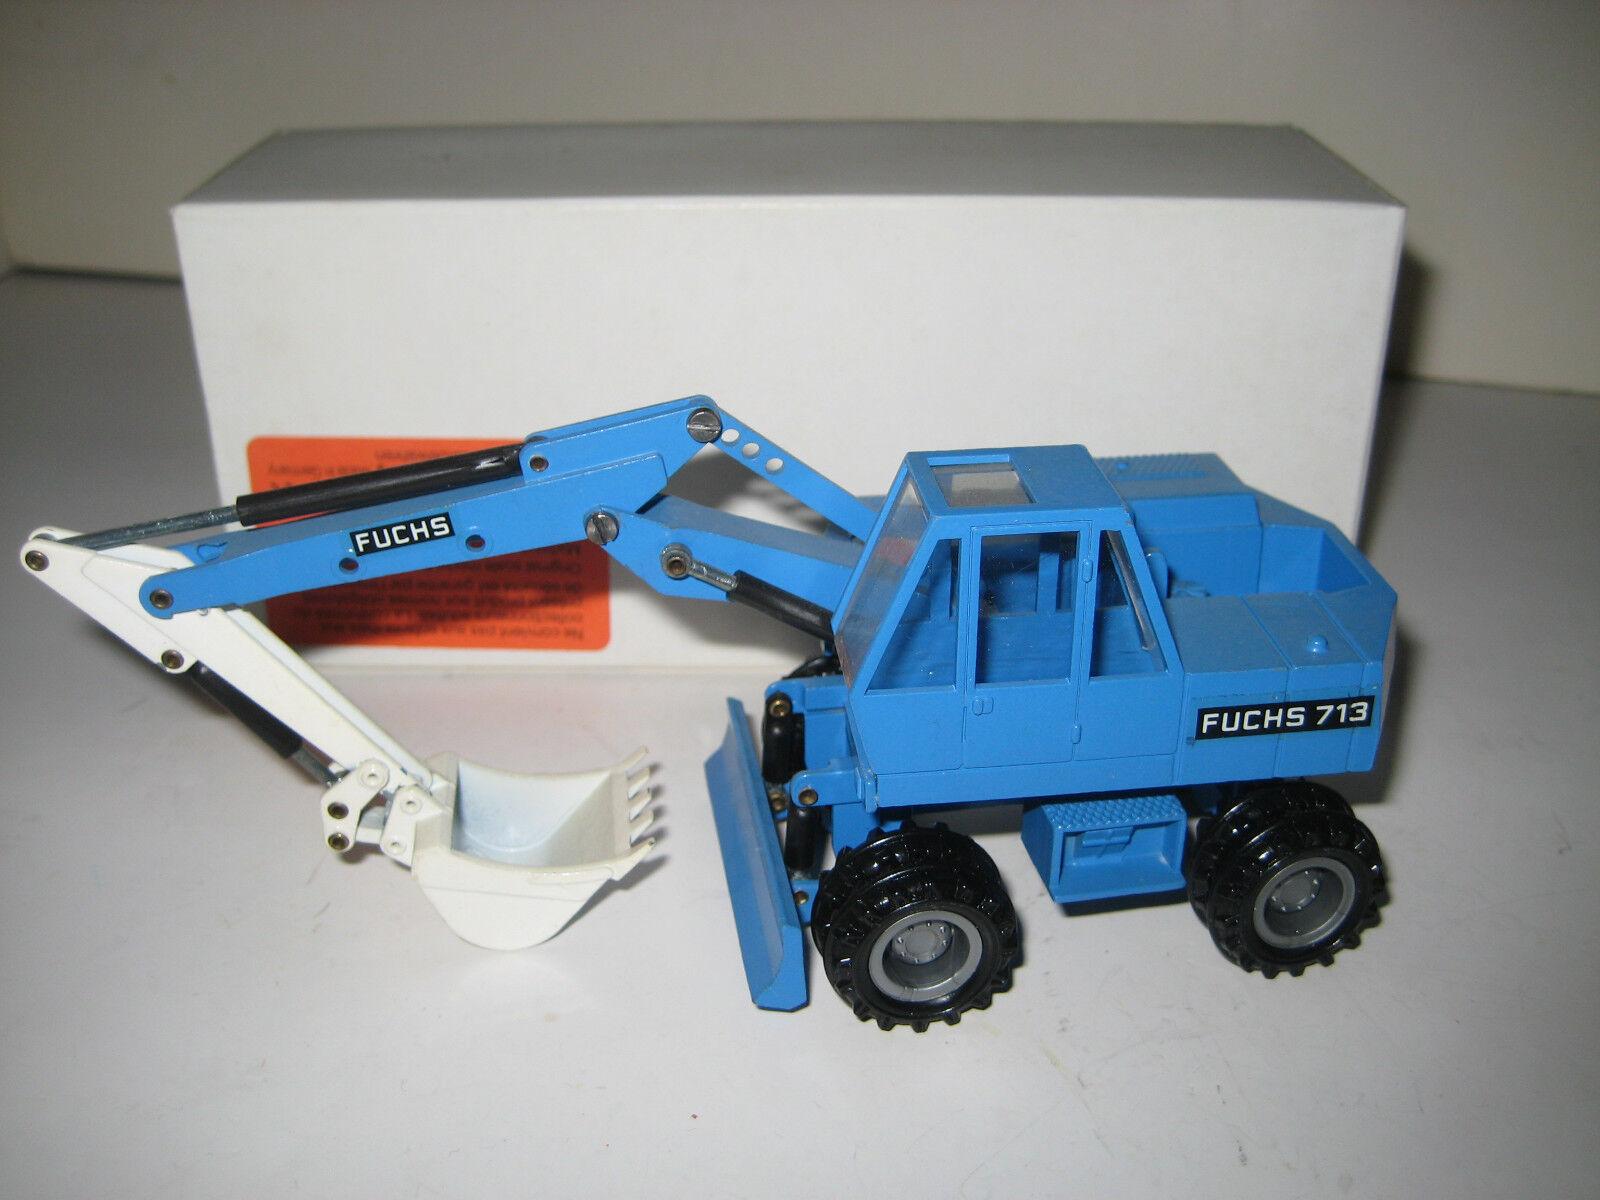 Fuchs 713 713 713 M Excavateurs tieflöffel mobile #165.3 NZG 1:50 neuf dans sa boîte | Vente  cc35bf